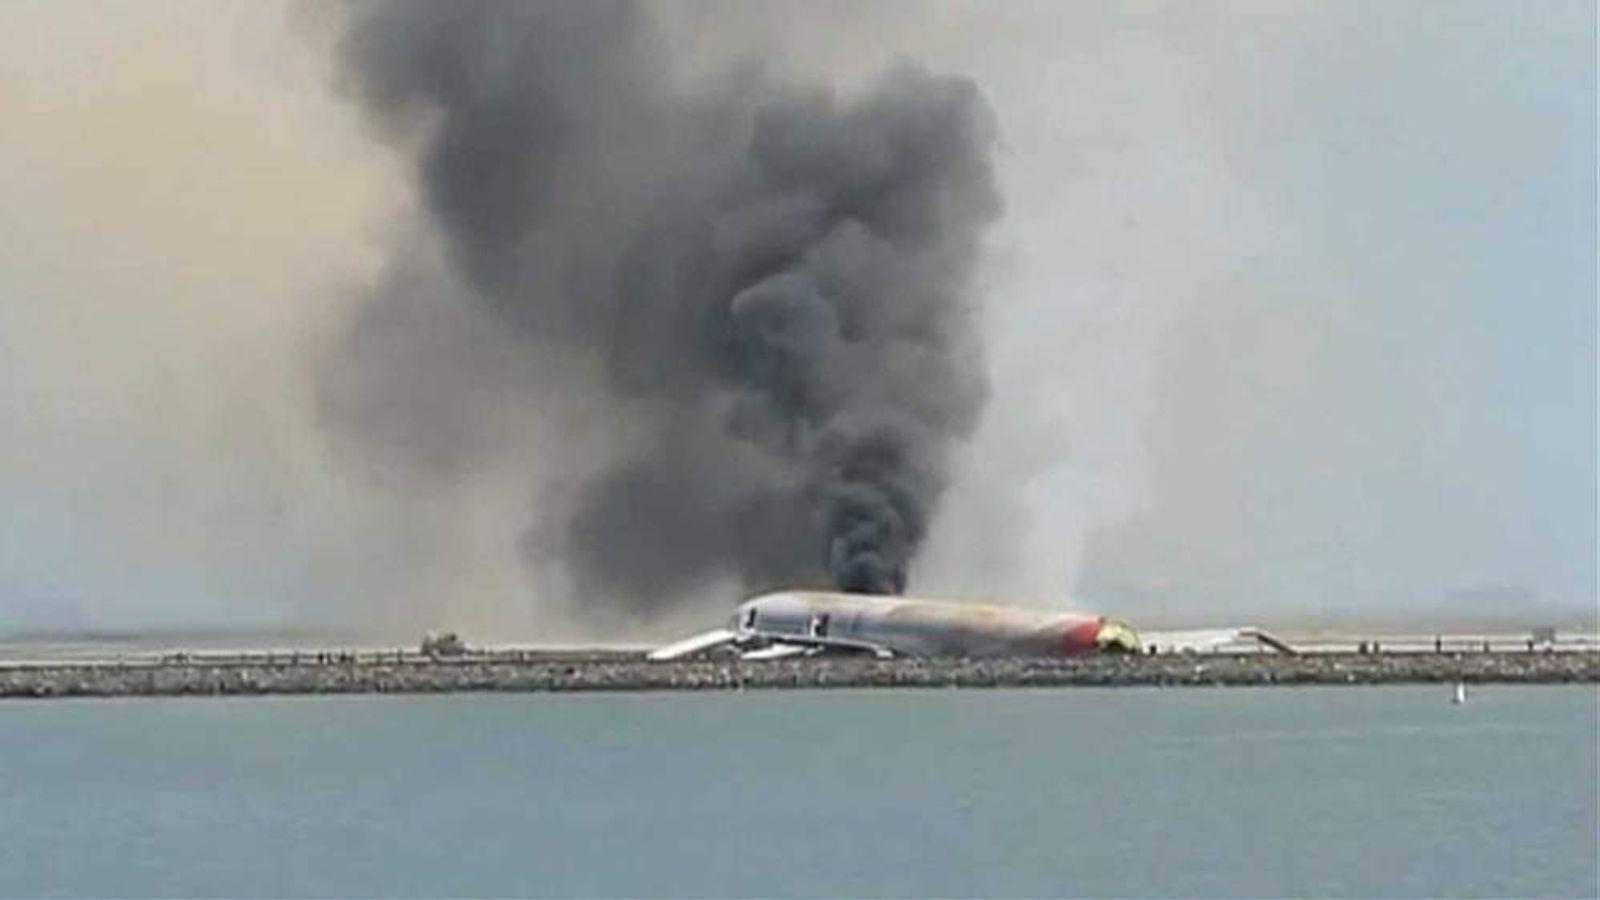 Smoke rising from wreckage of passenger jet in San Francisco